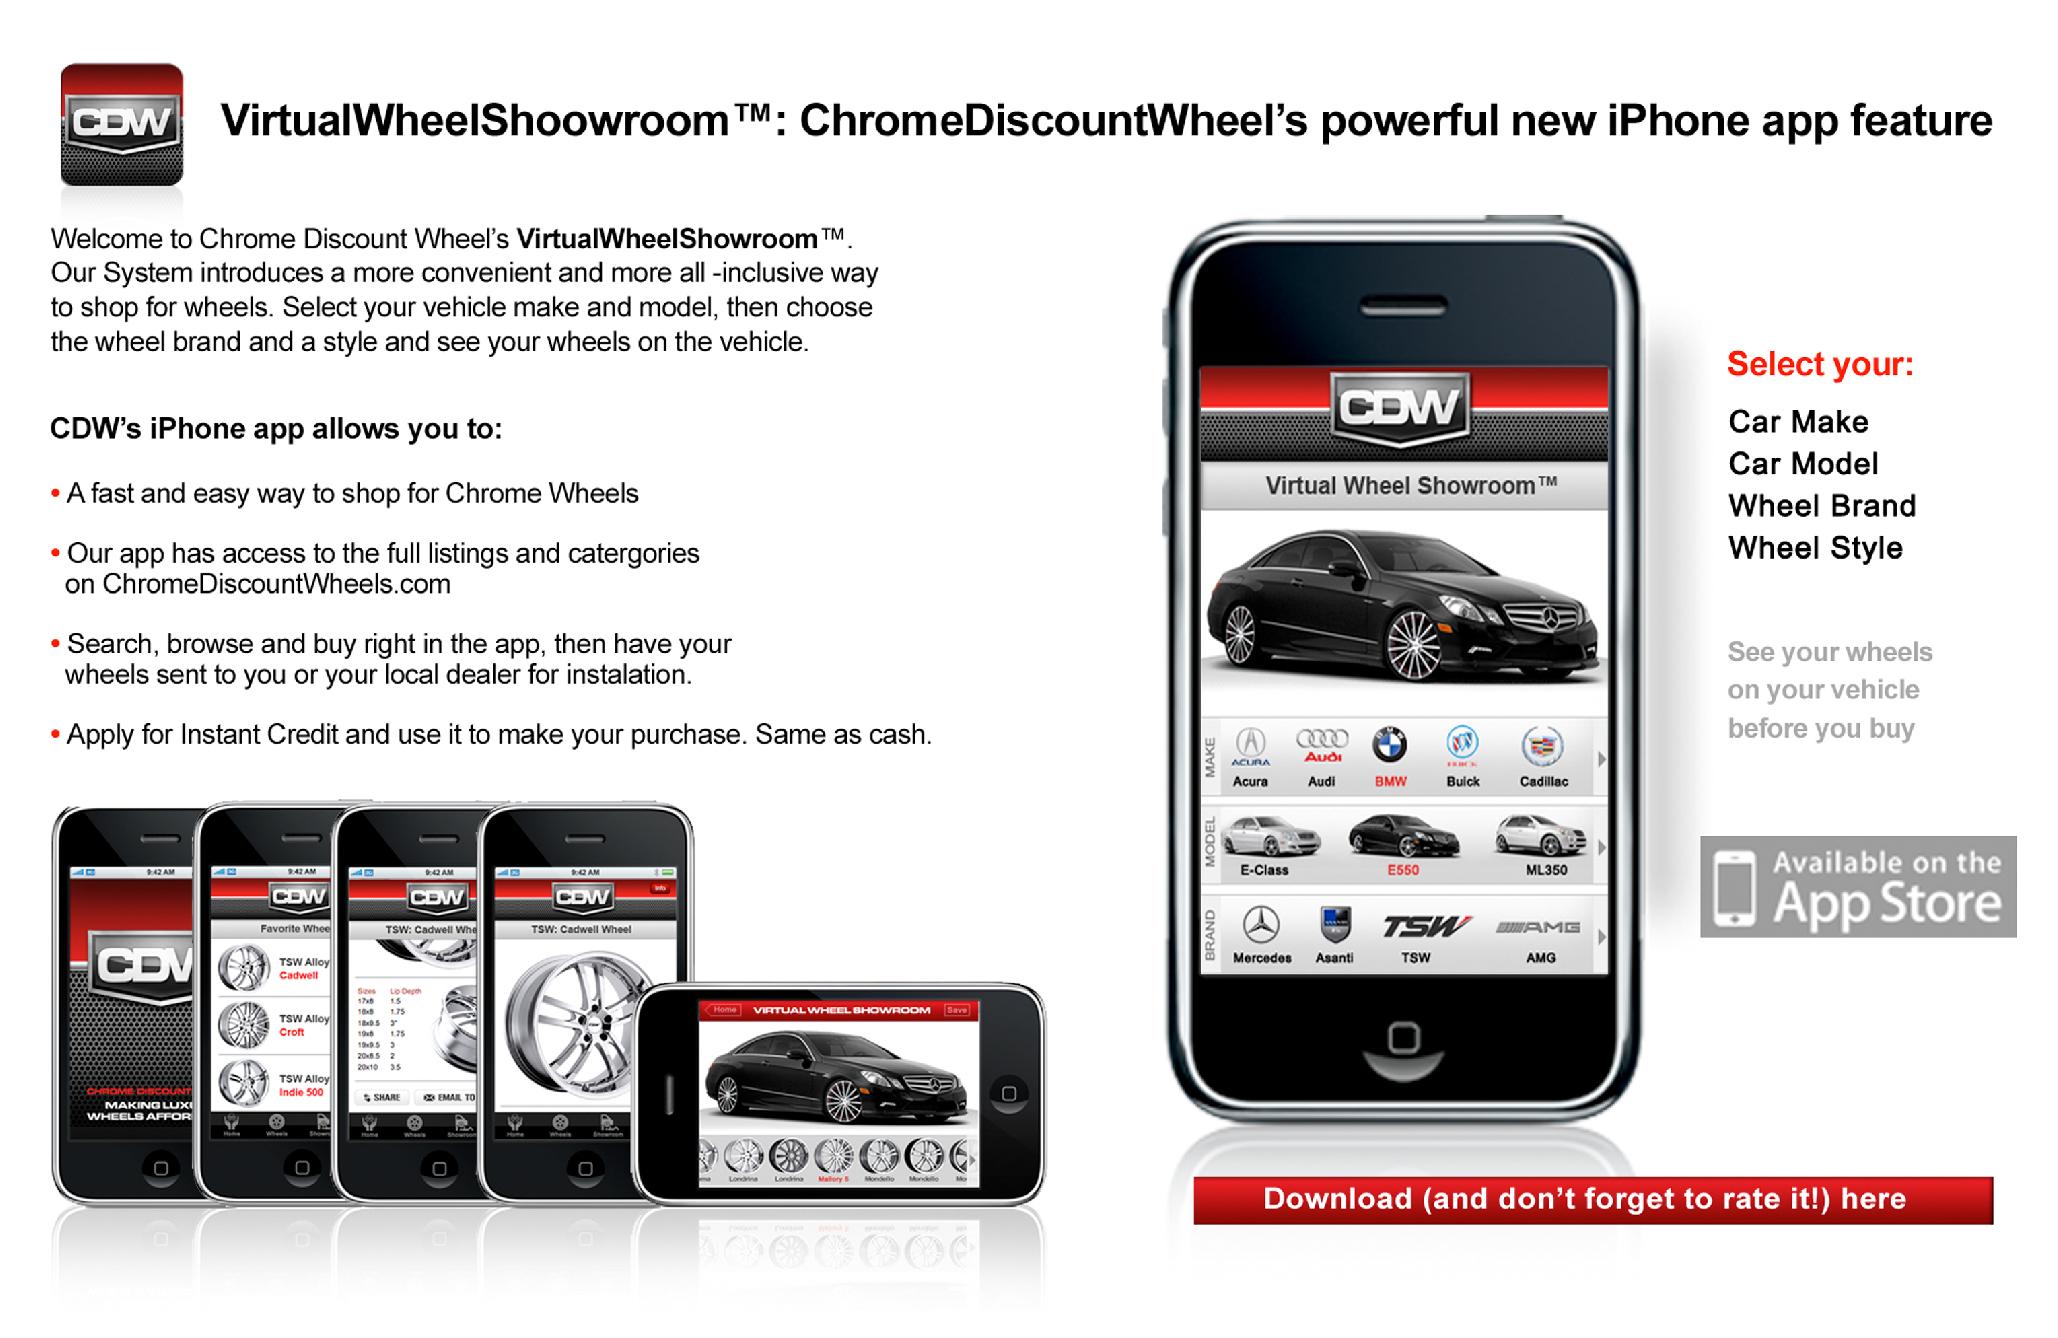 Virtual Wheel Showroom by Chrome Discount Wheels 1